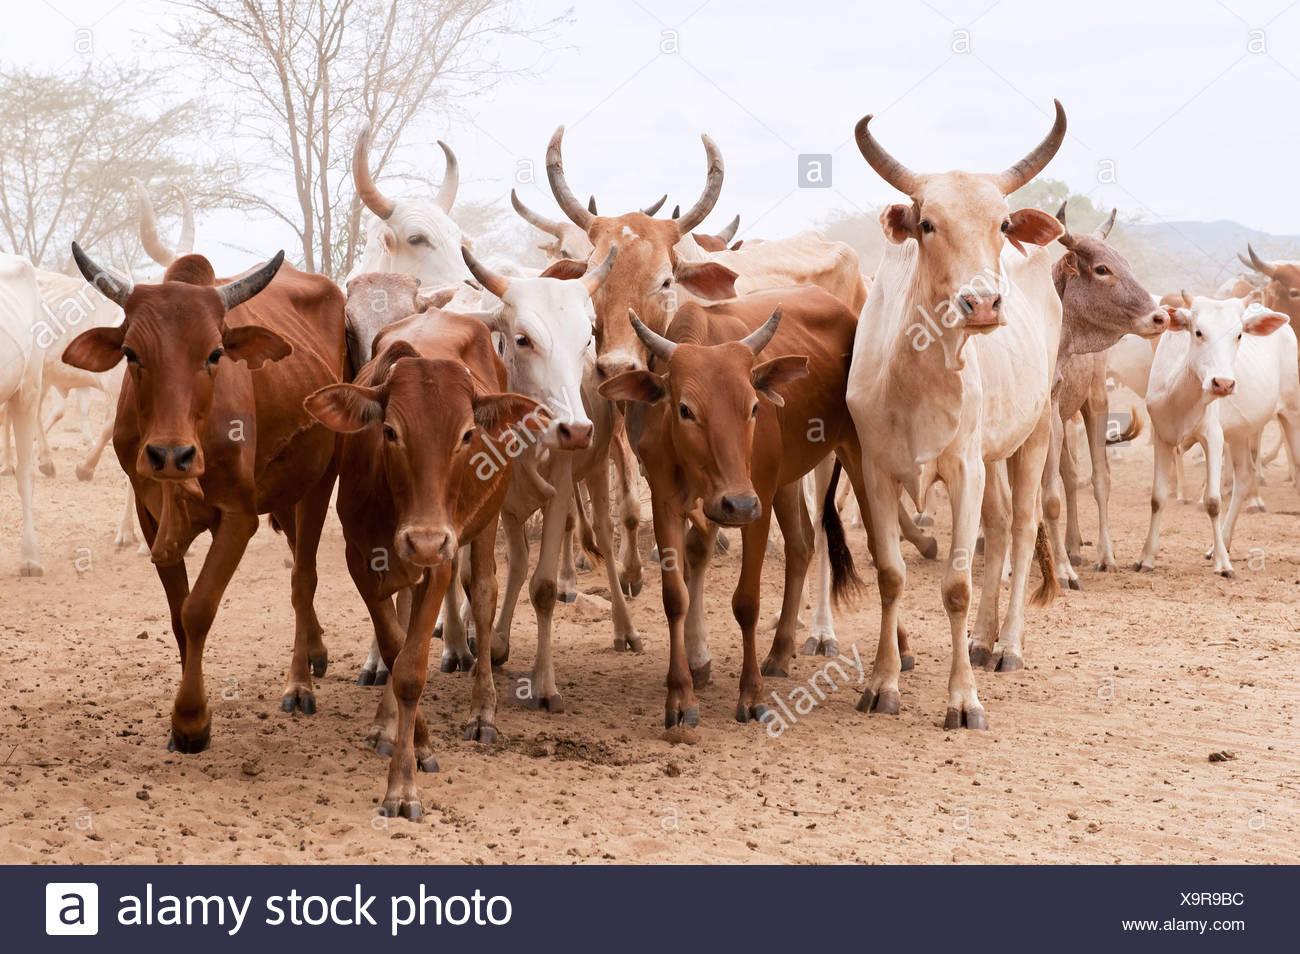 Cattle herd - Stock Image